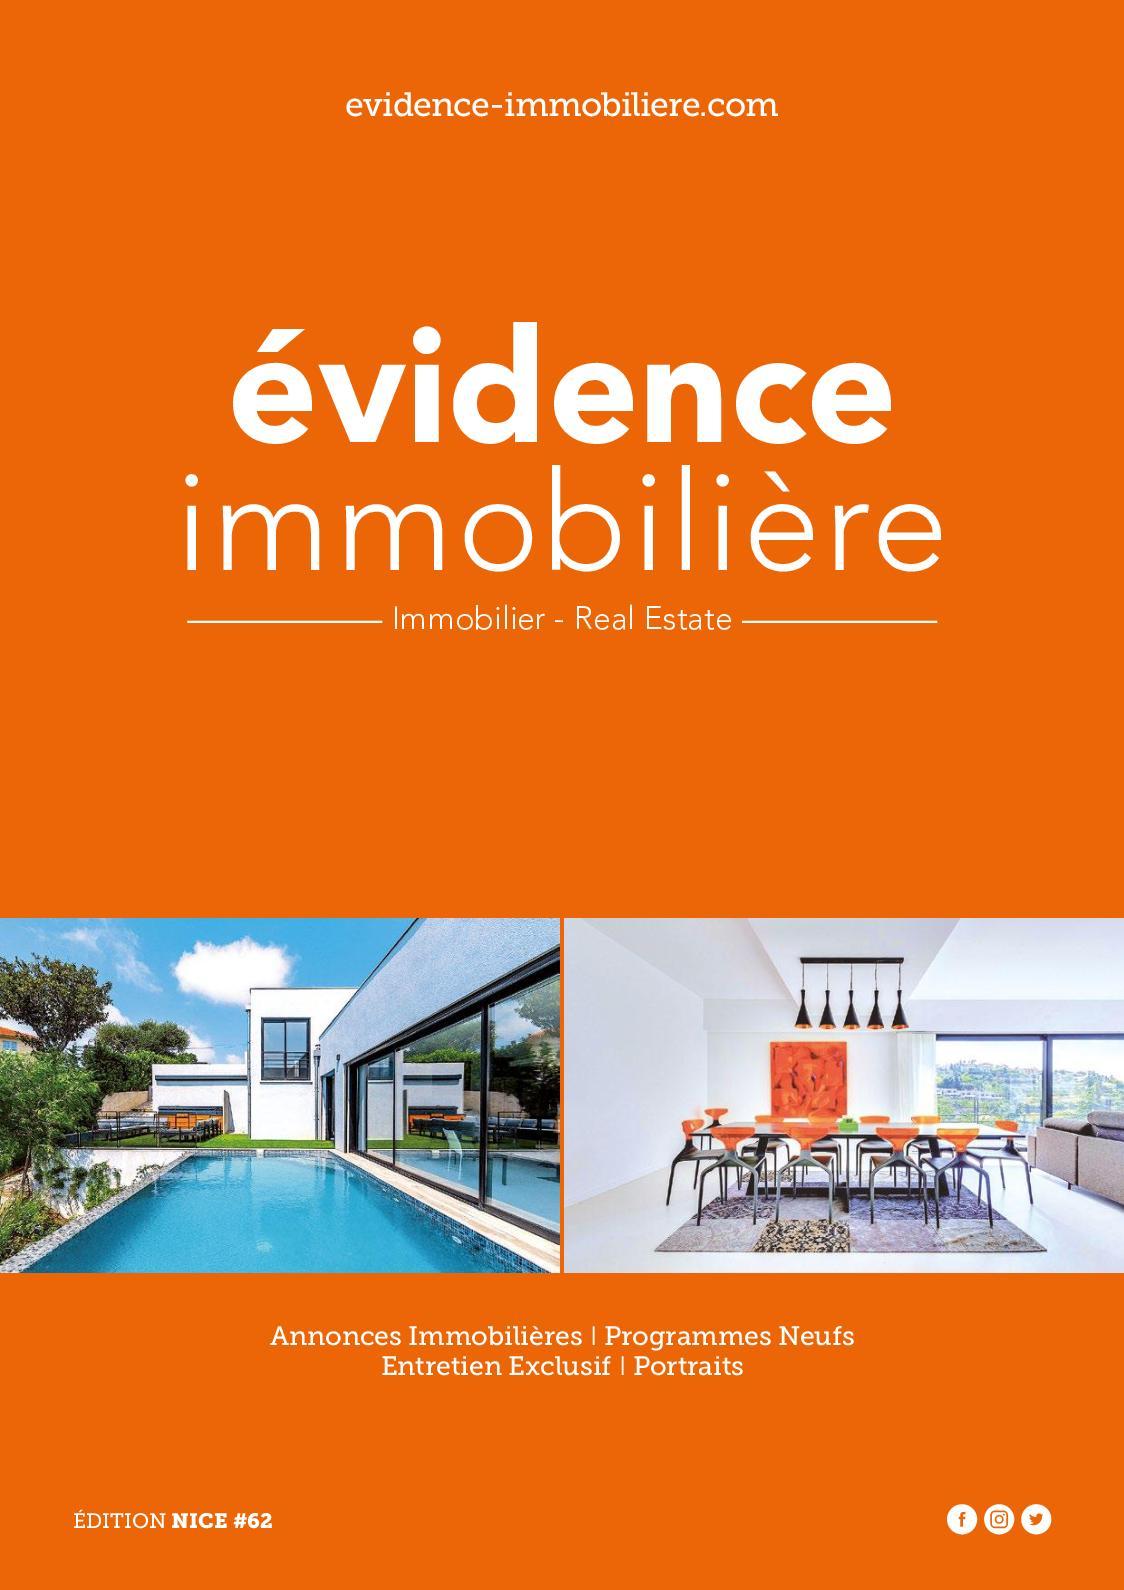 Calaméo - Evidence Immobilière Côte d Azur N°62 - Oct. 2018 228aaade374c